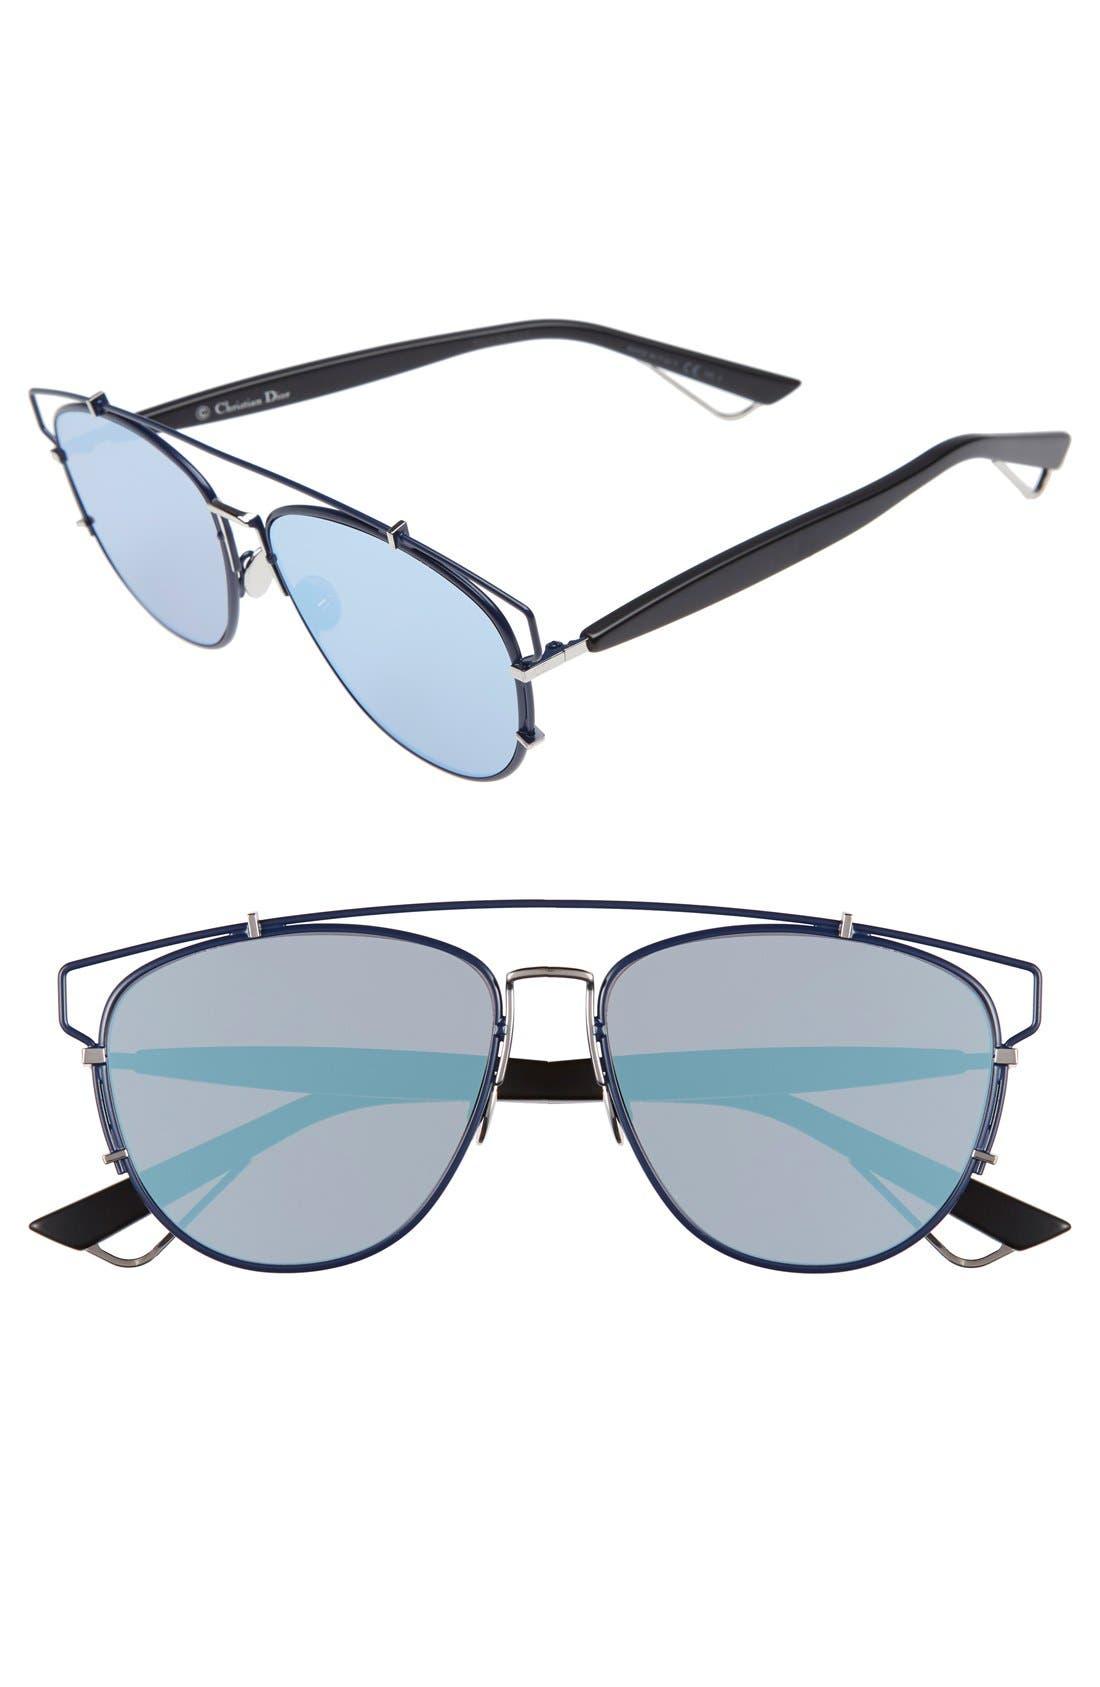 Technologic 57mm Brow Bar Sunglasses,                             Main thumbnail 8, color,